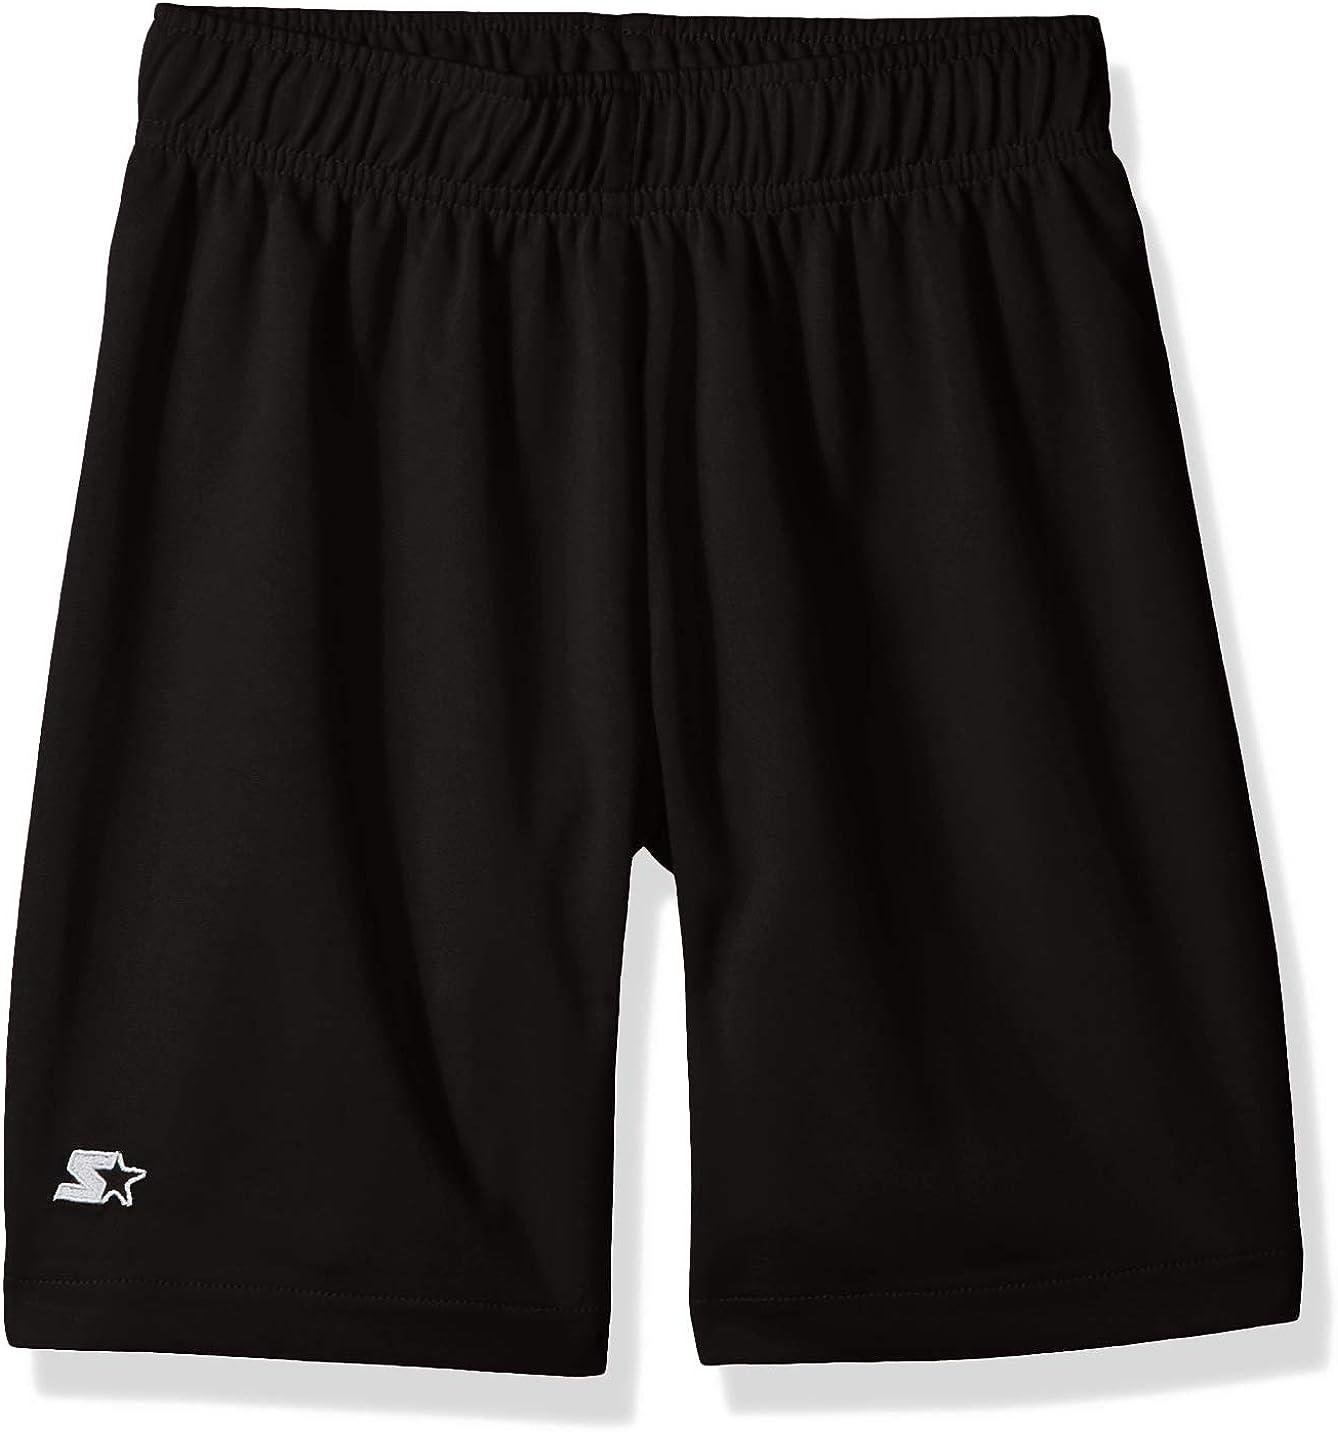 Starter Boys Knit Soccer Short Exclusive